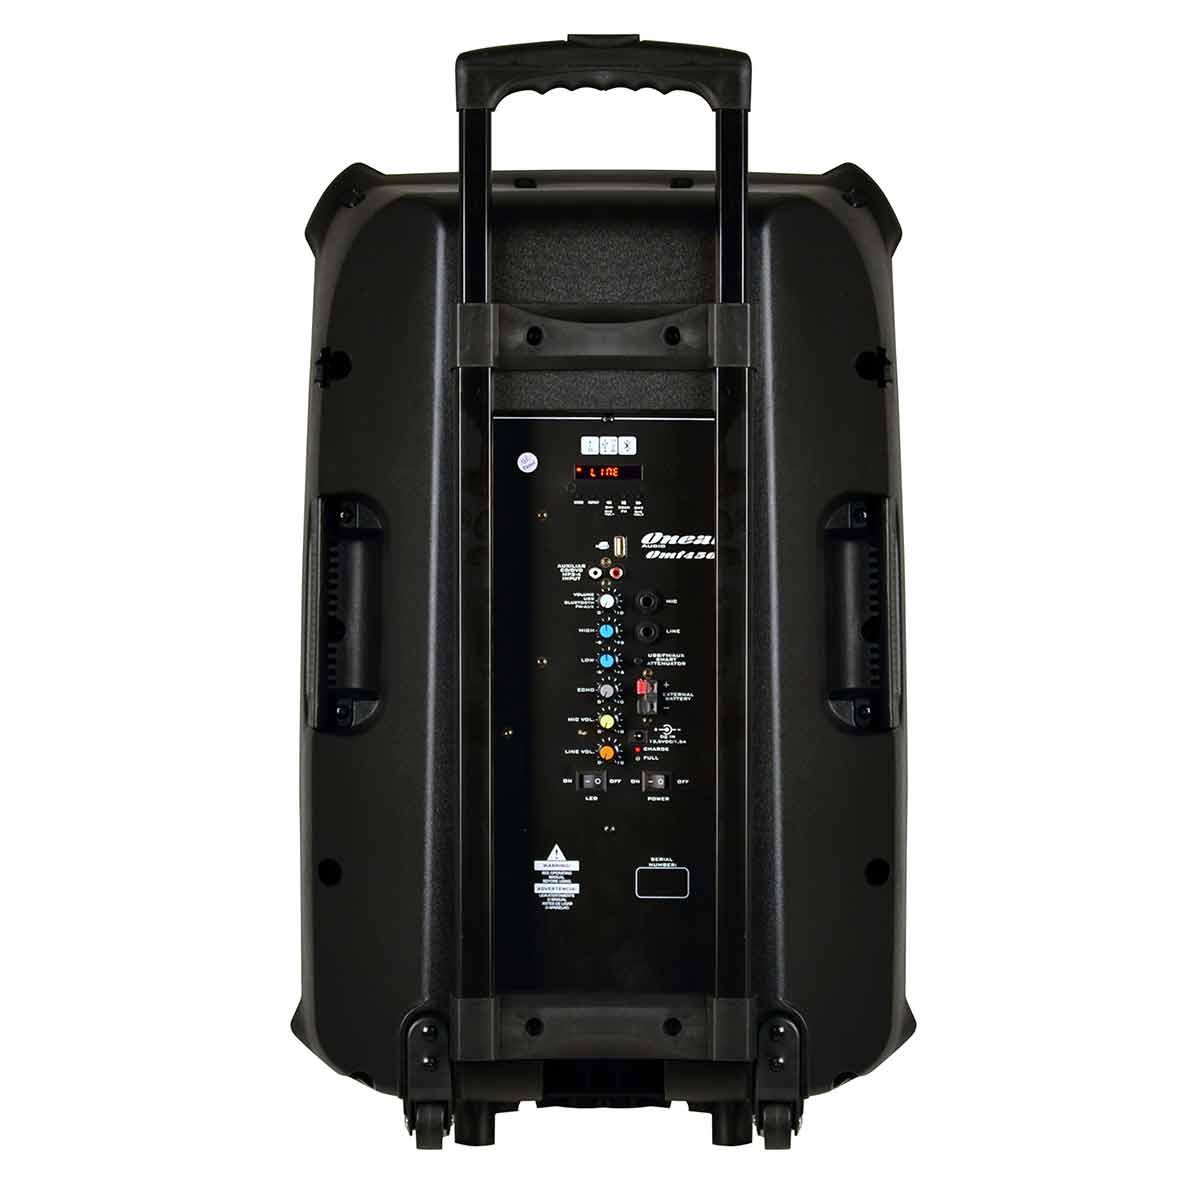 OMF450 - Caixa Port�til c/ Bateria, Bluetooth e USB 120W OMF 450 - Oneal